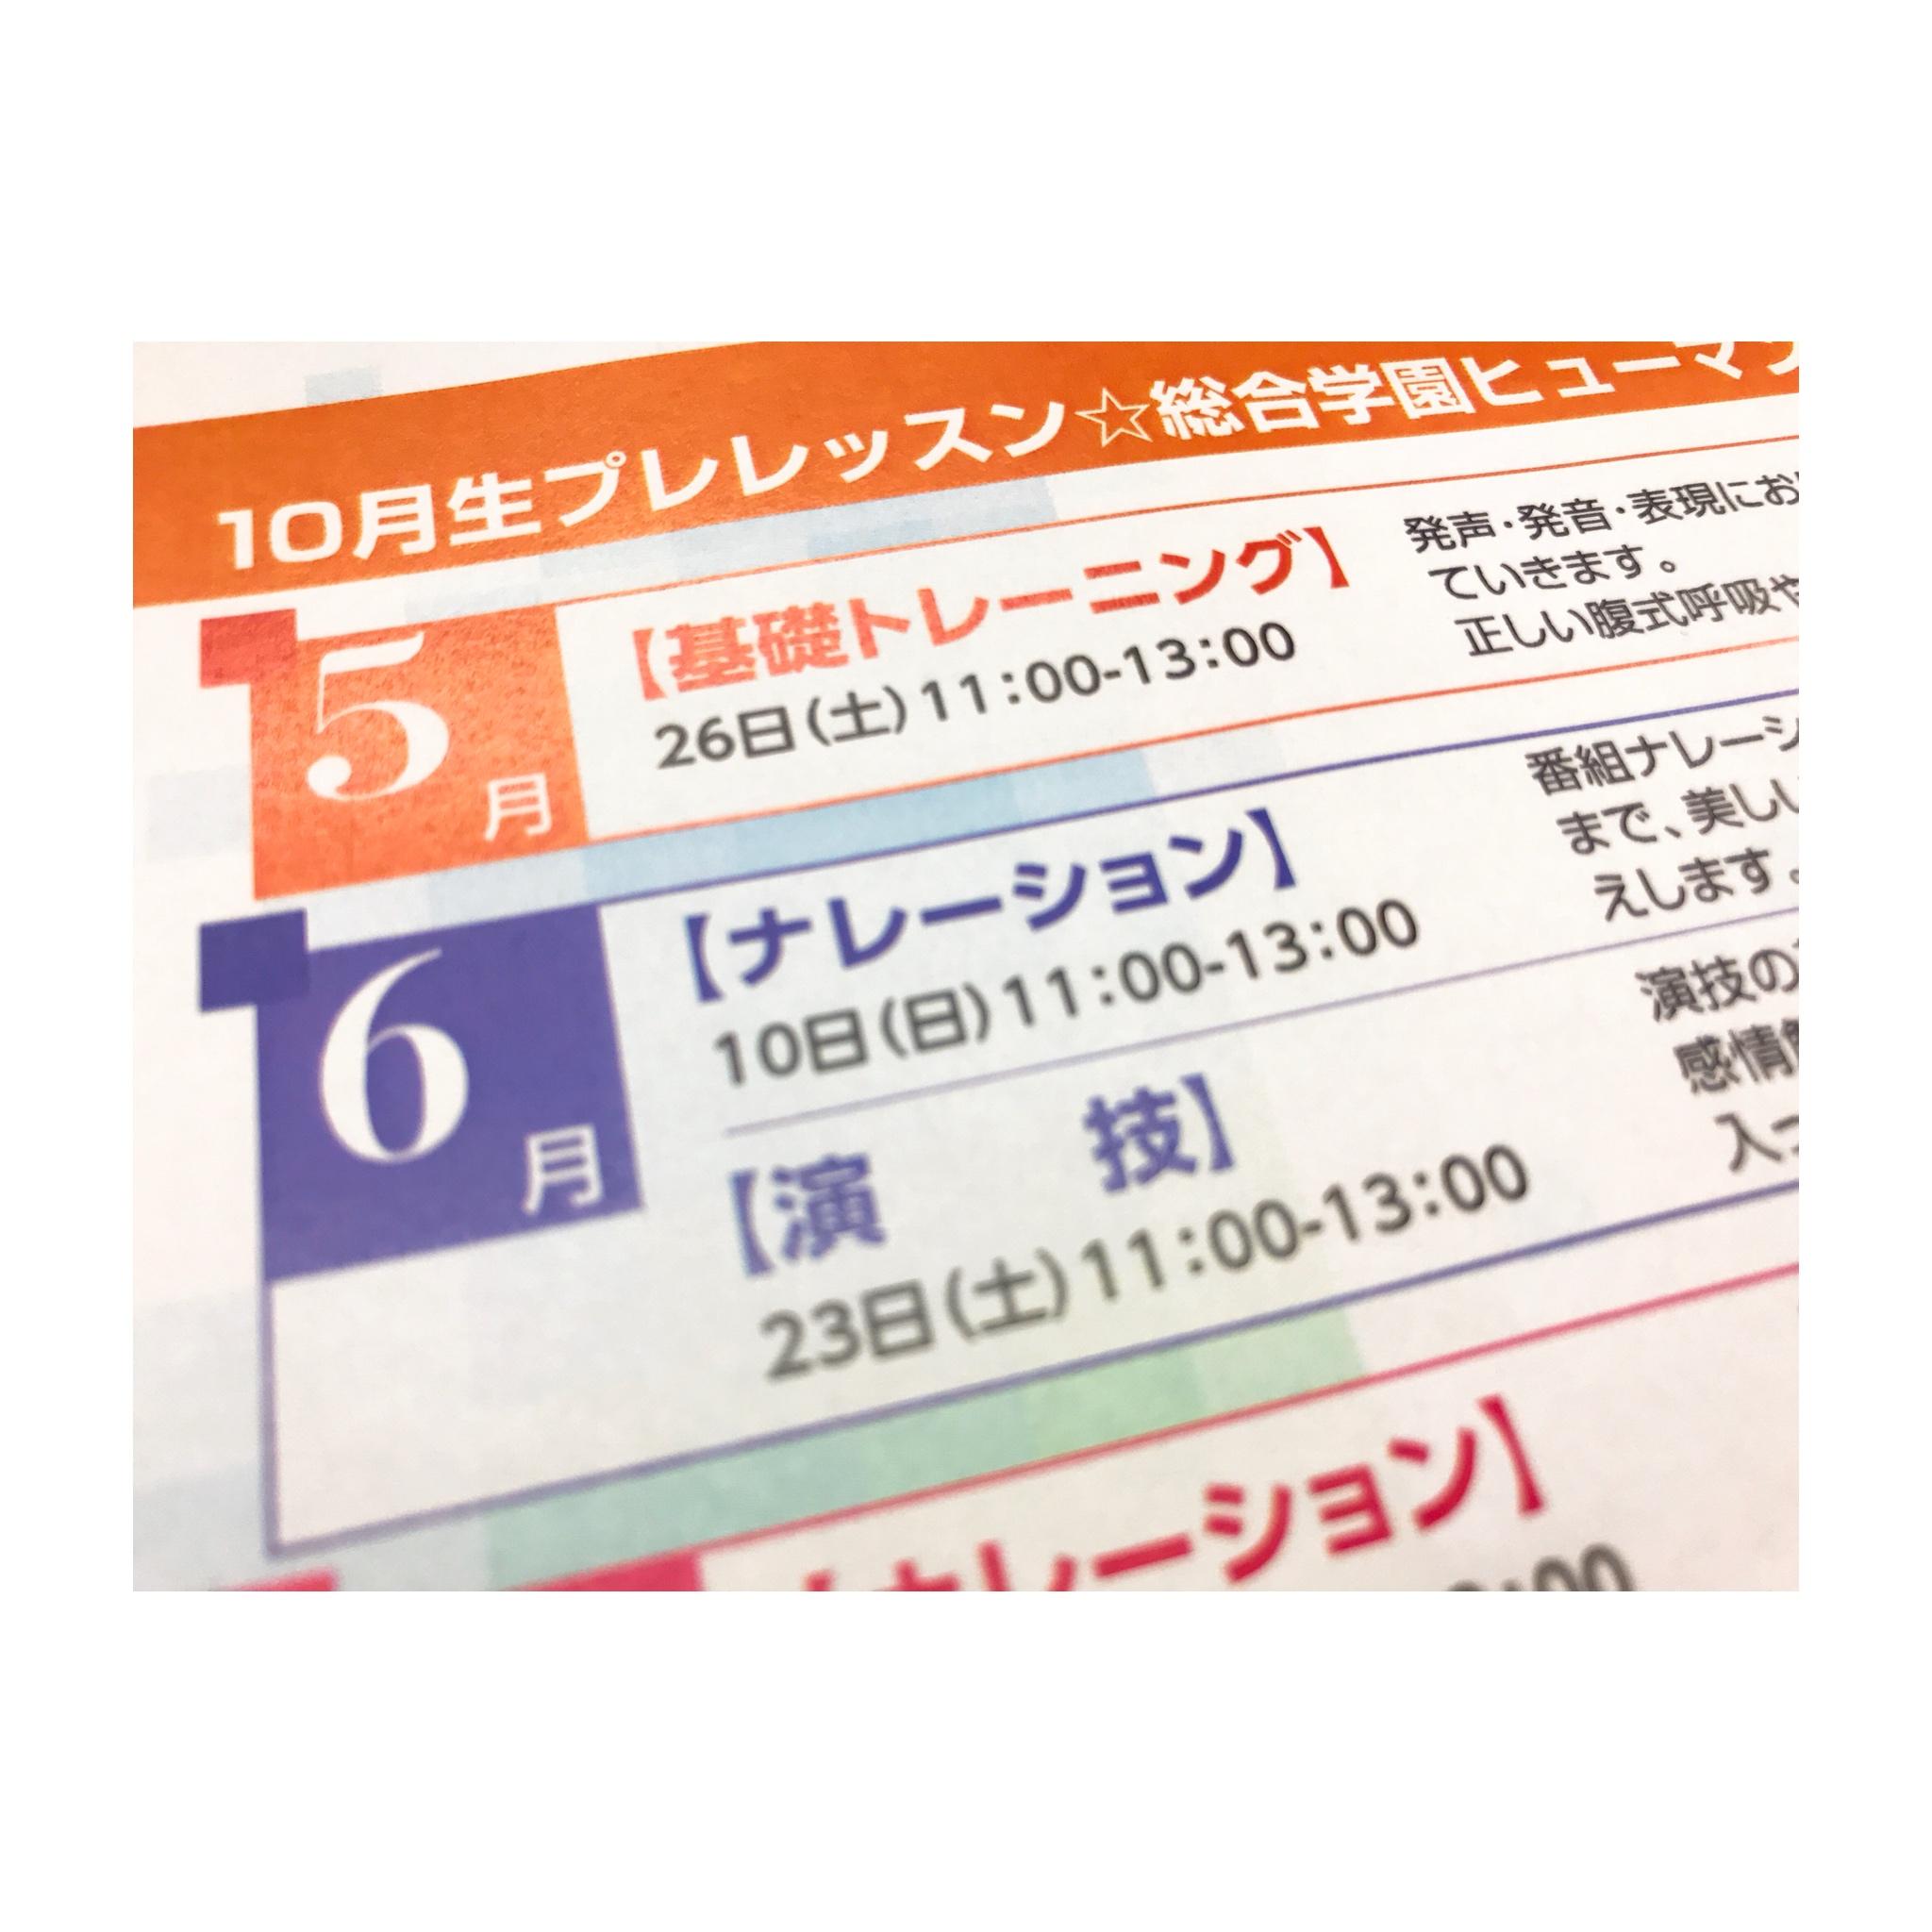 IMG_9884.JPG